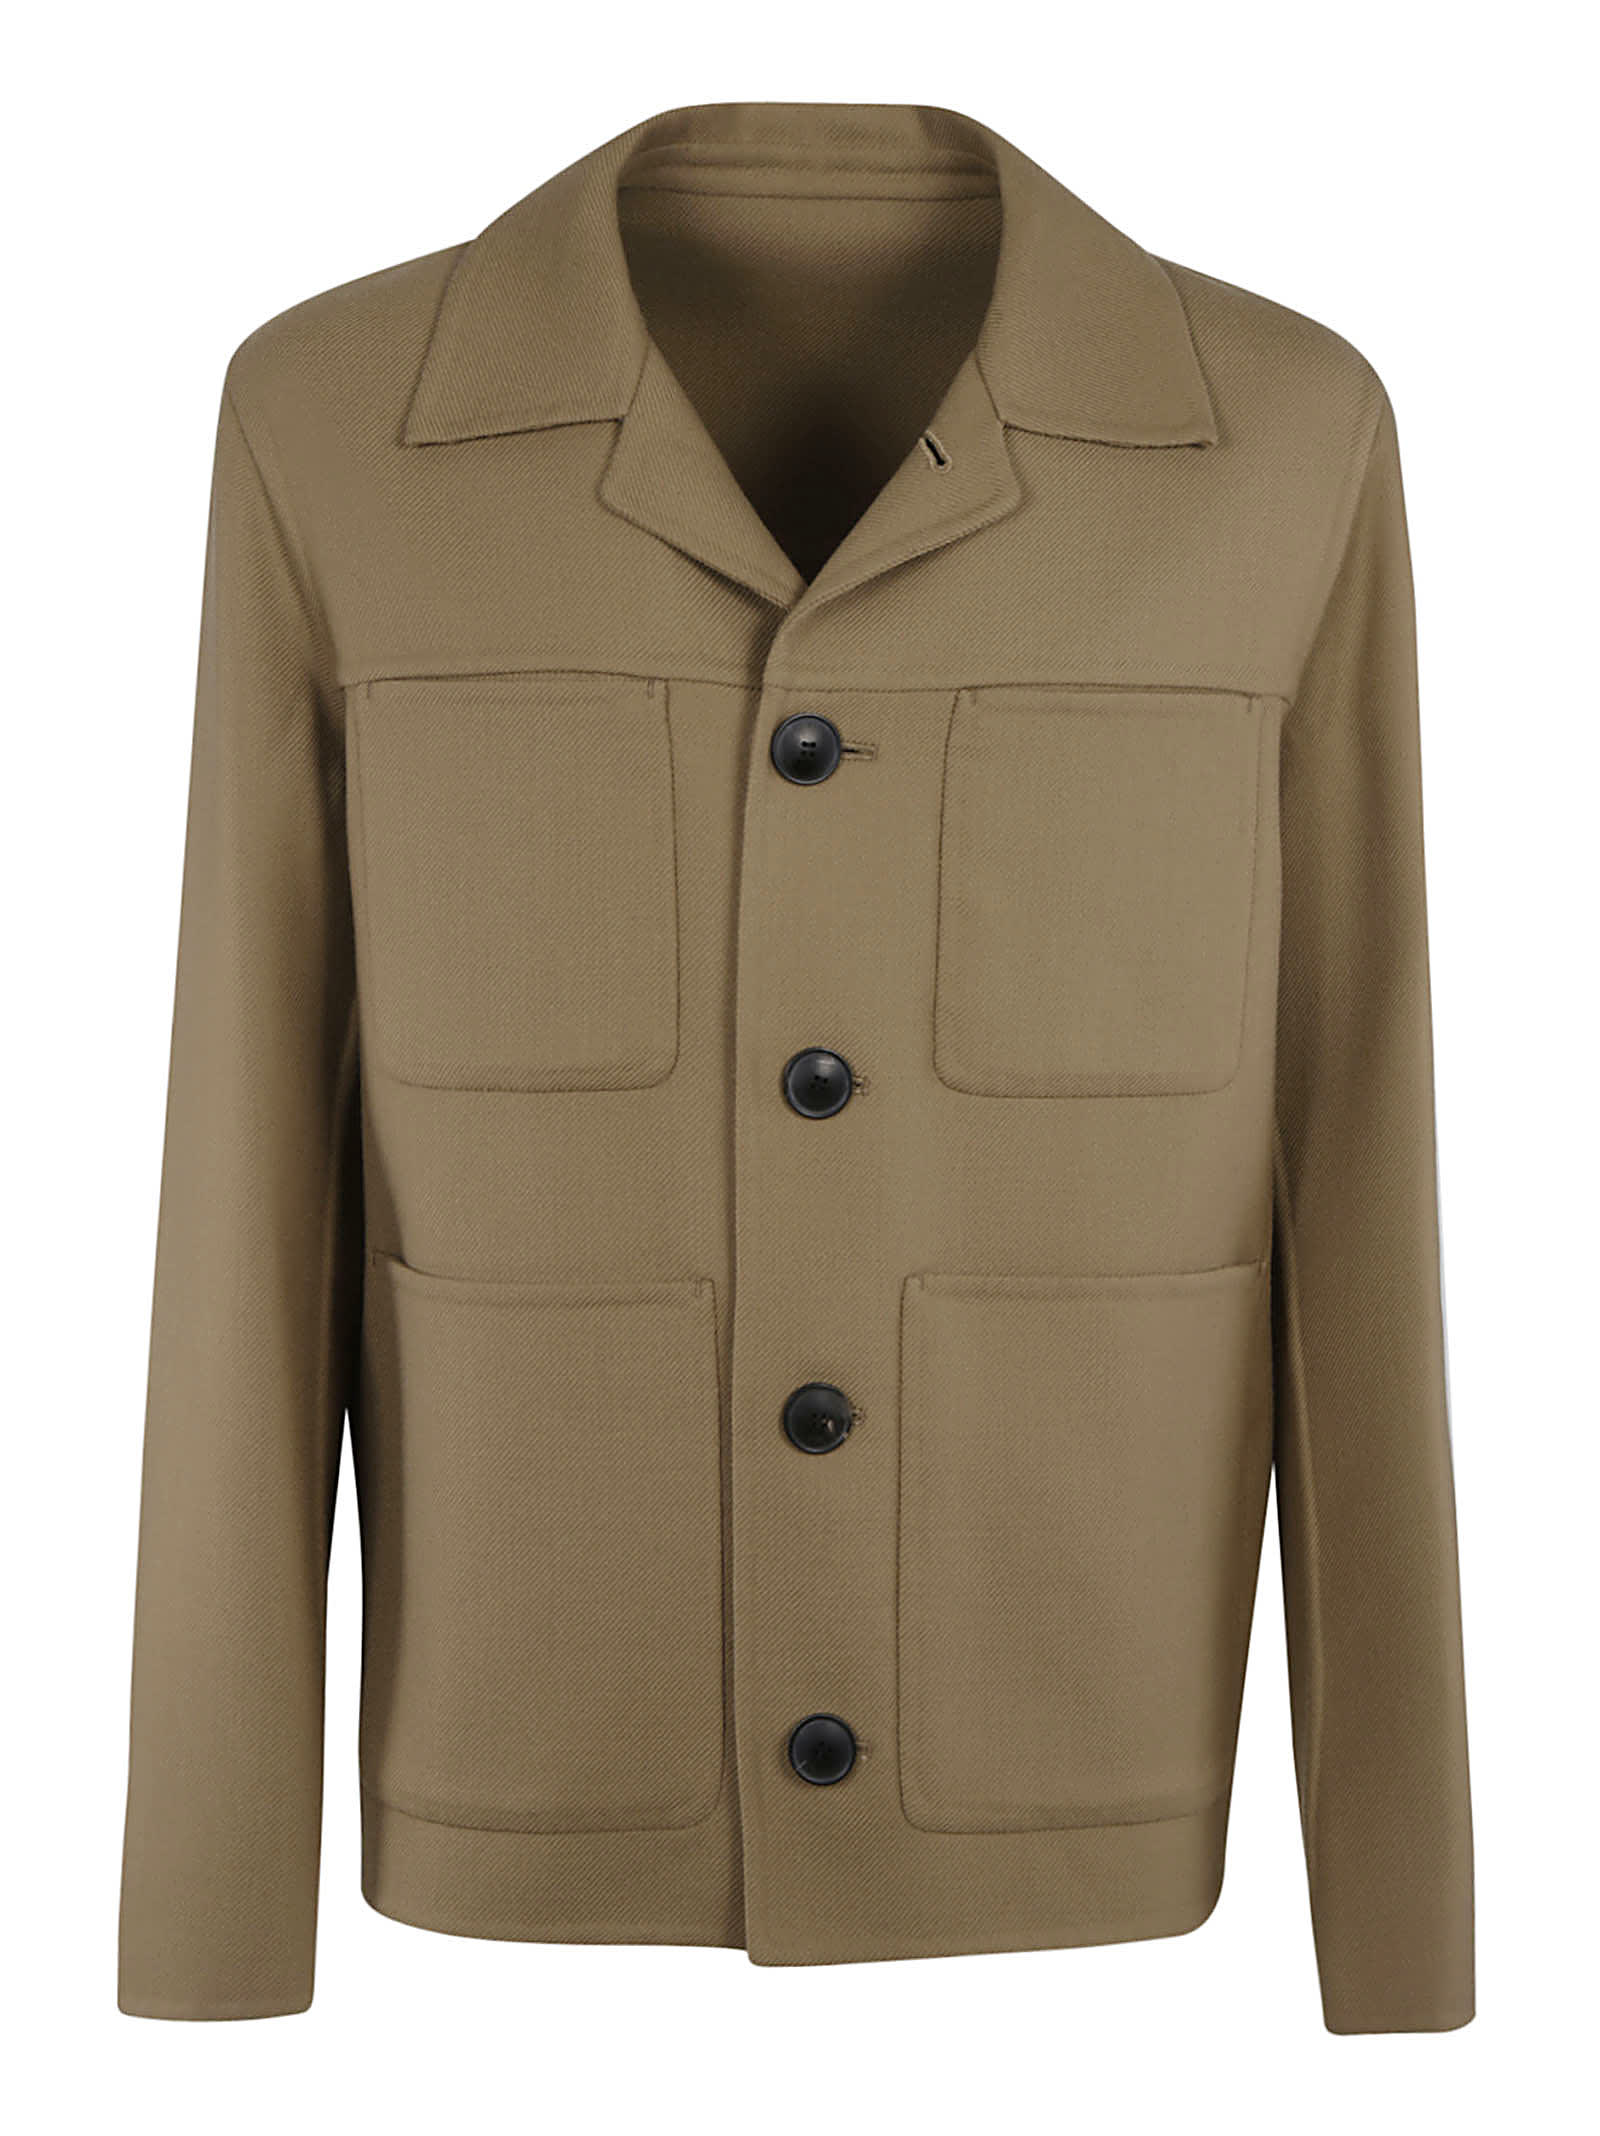 Ami Alexandre Mattiussi Multi-pocket Plain Jacket